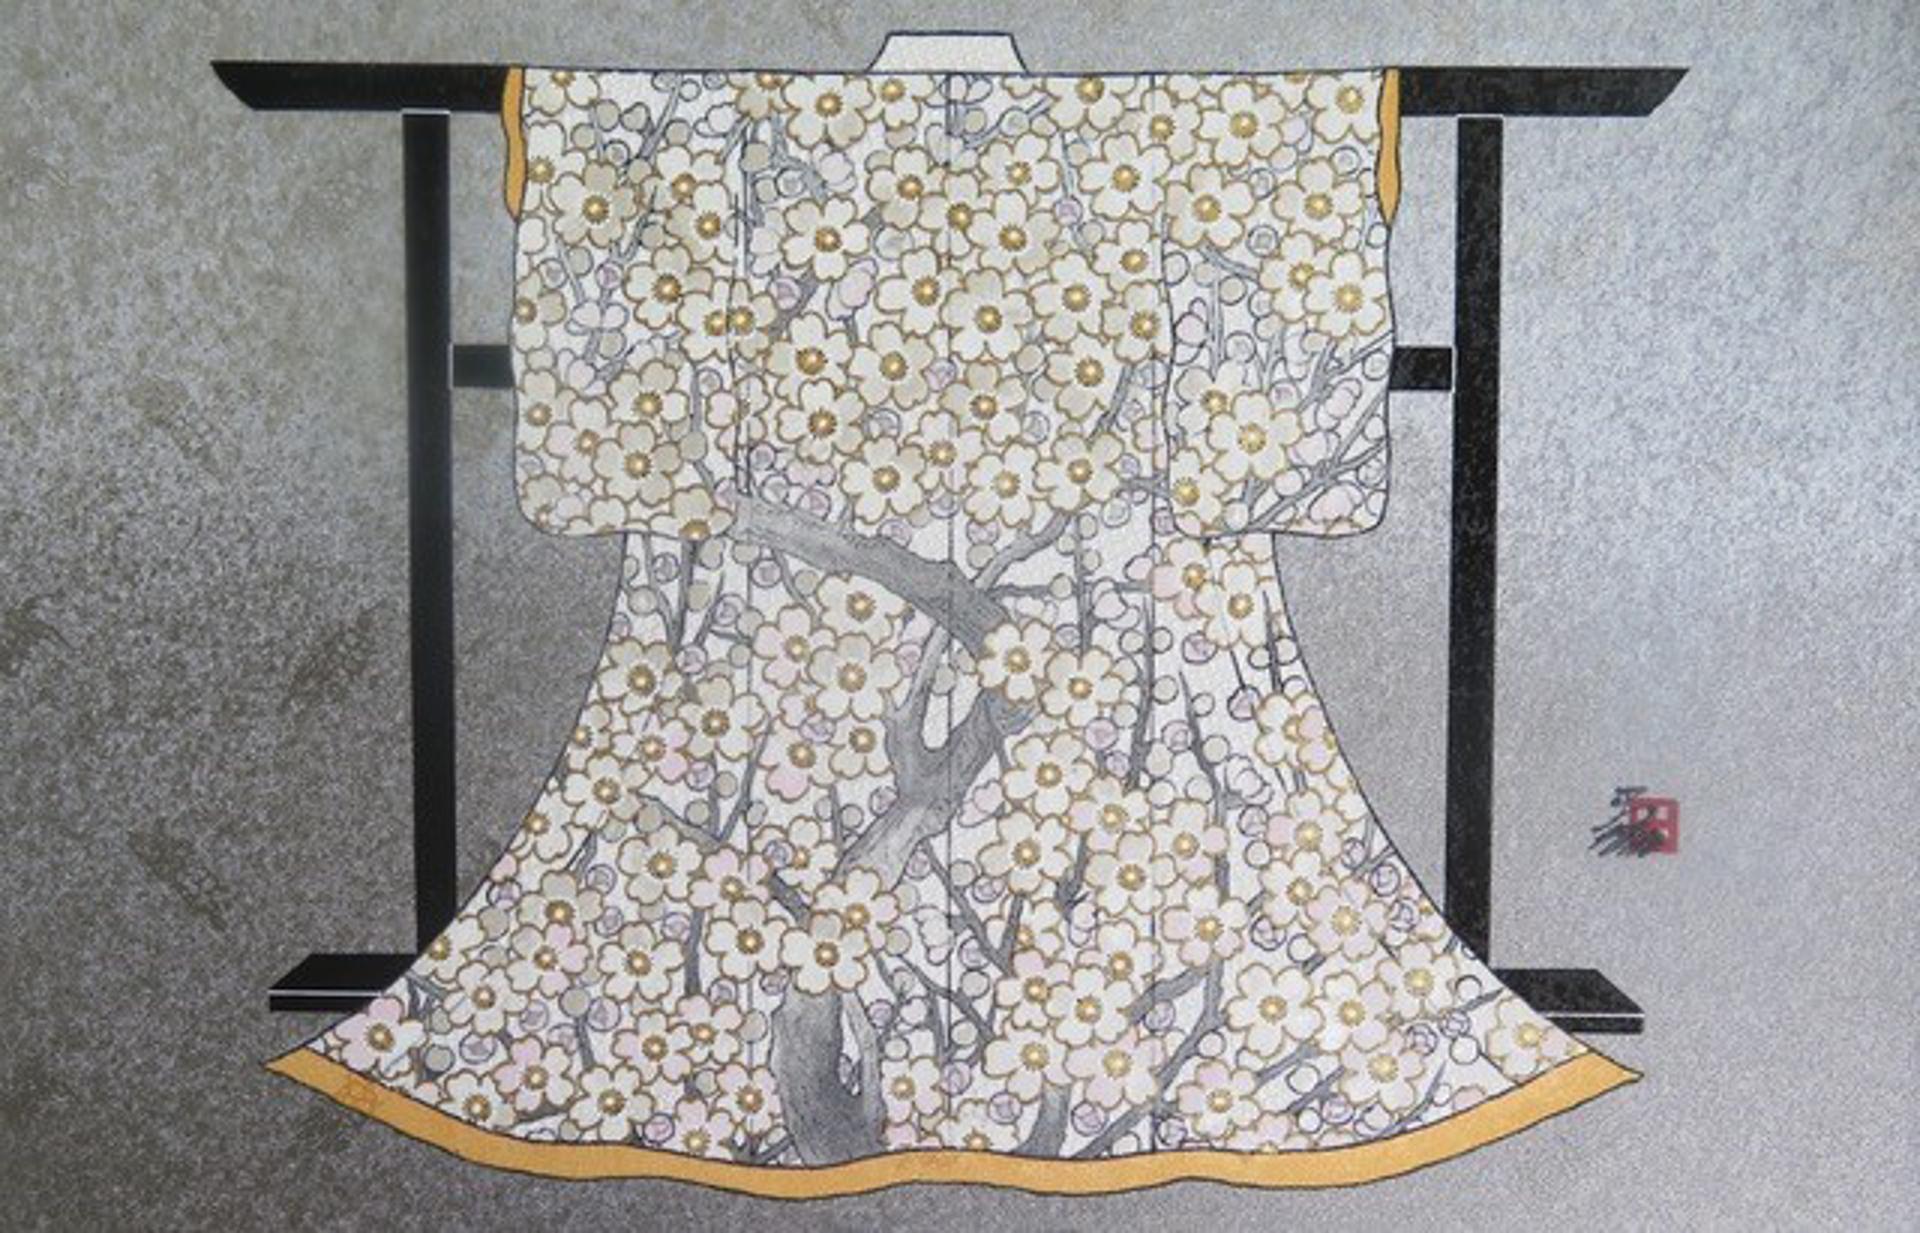 NATURE'S KEEPER #8 (Mini Kimono) by Hisashi Otsuka